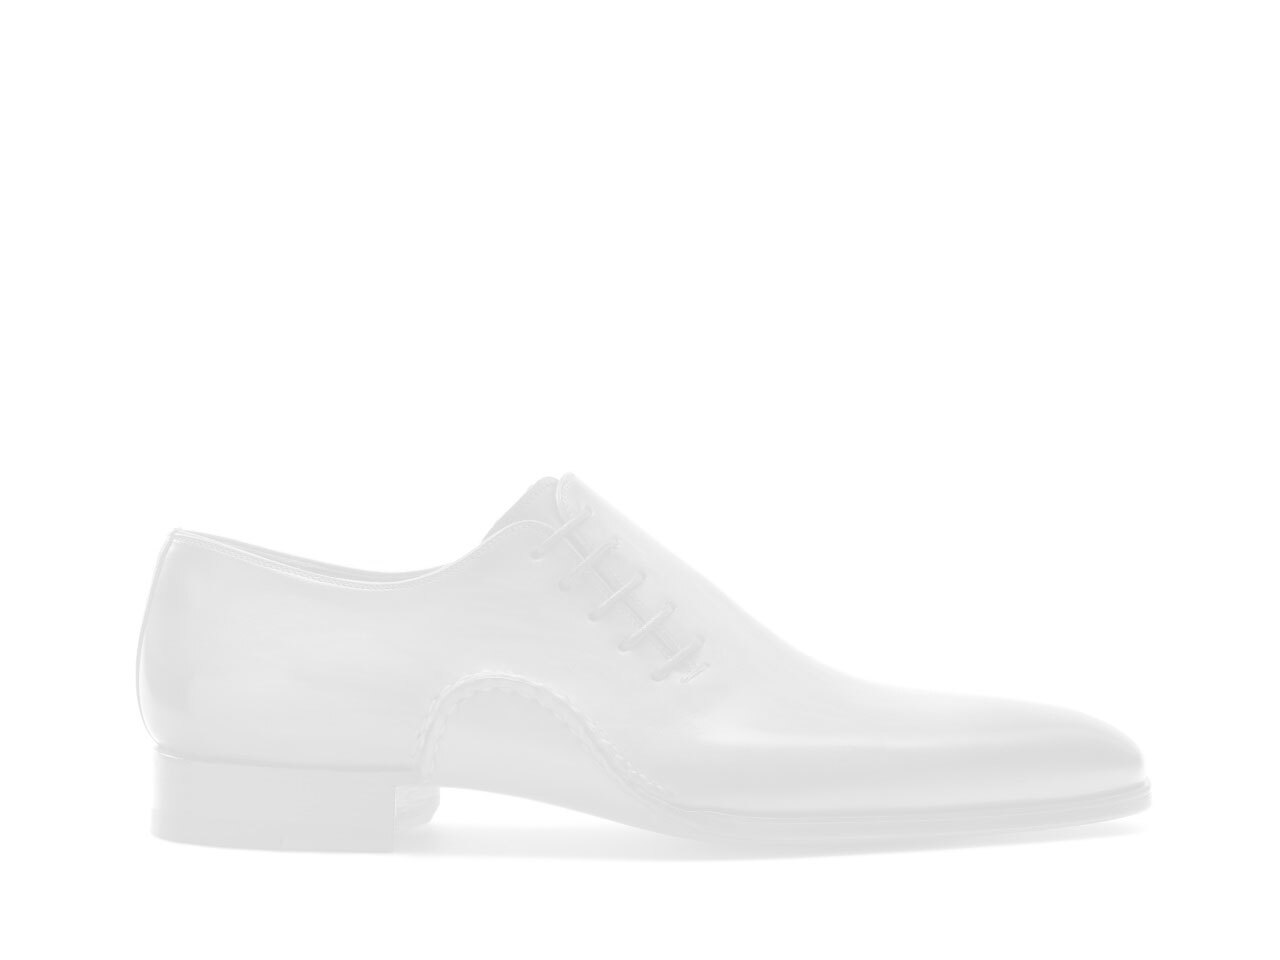 Essential Shoe Care Kit | Neutral